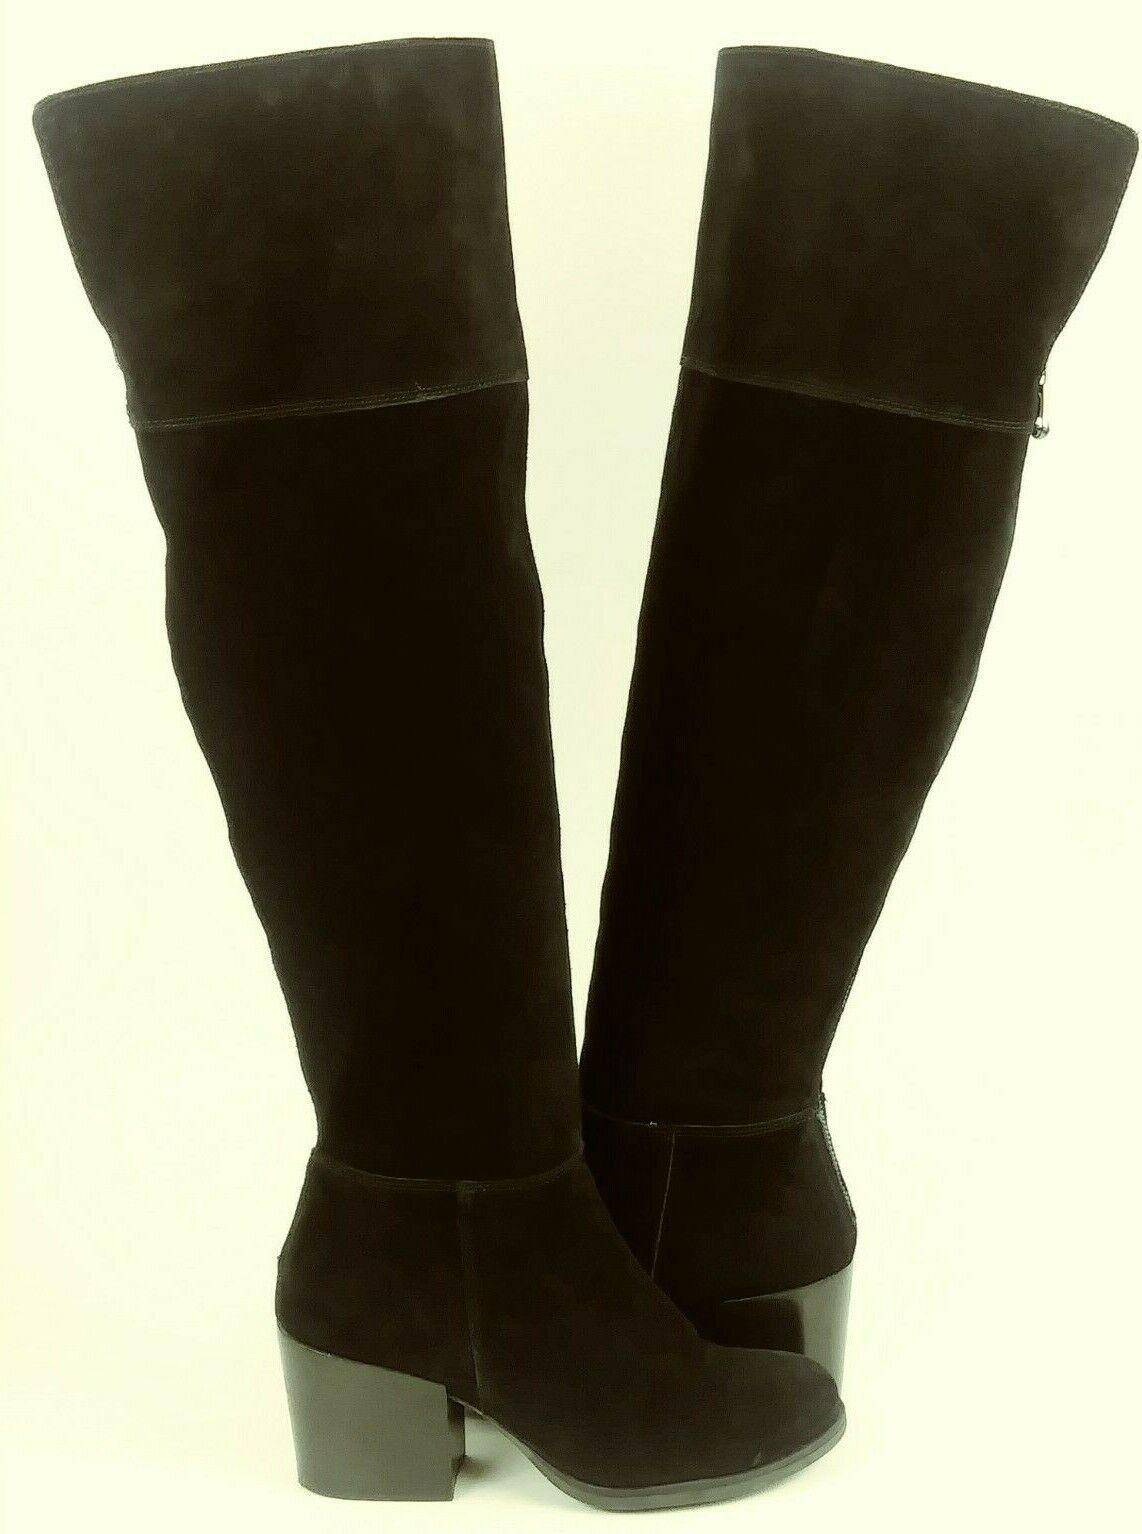 Steve Madden ORABELA Womens Boots Tall OTK US 5 Black Suede Textile Heels 1100